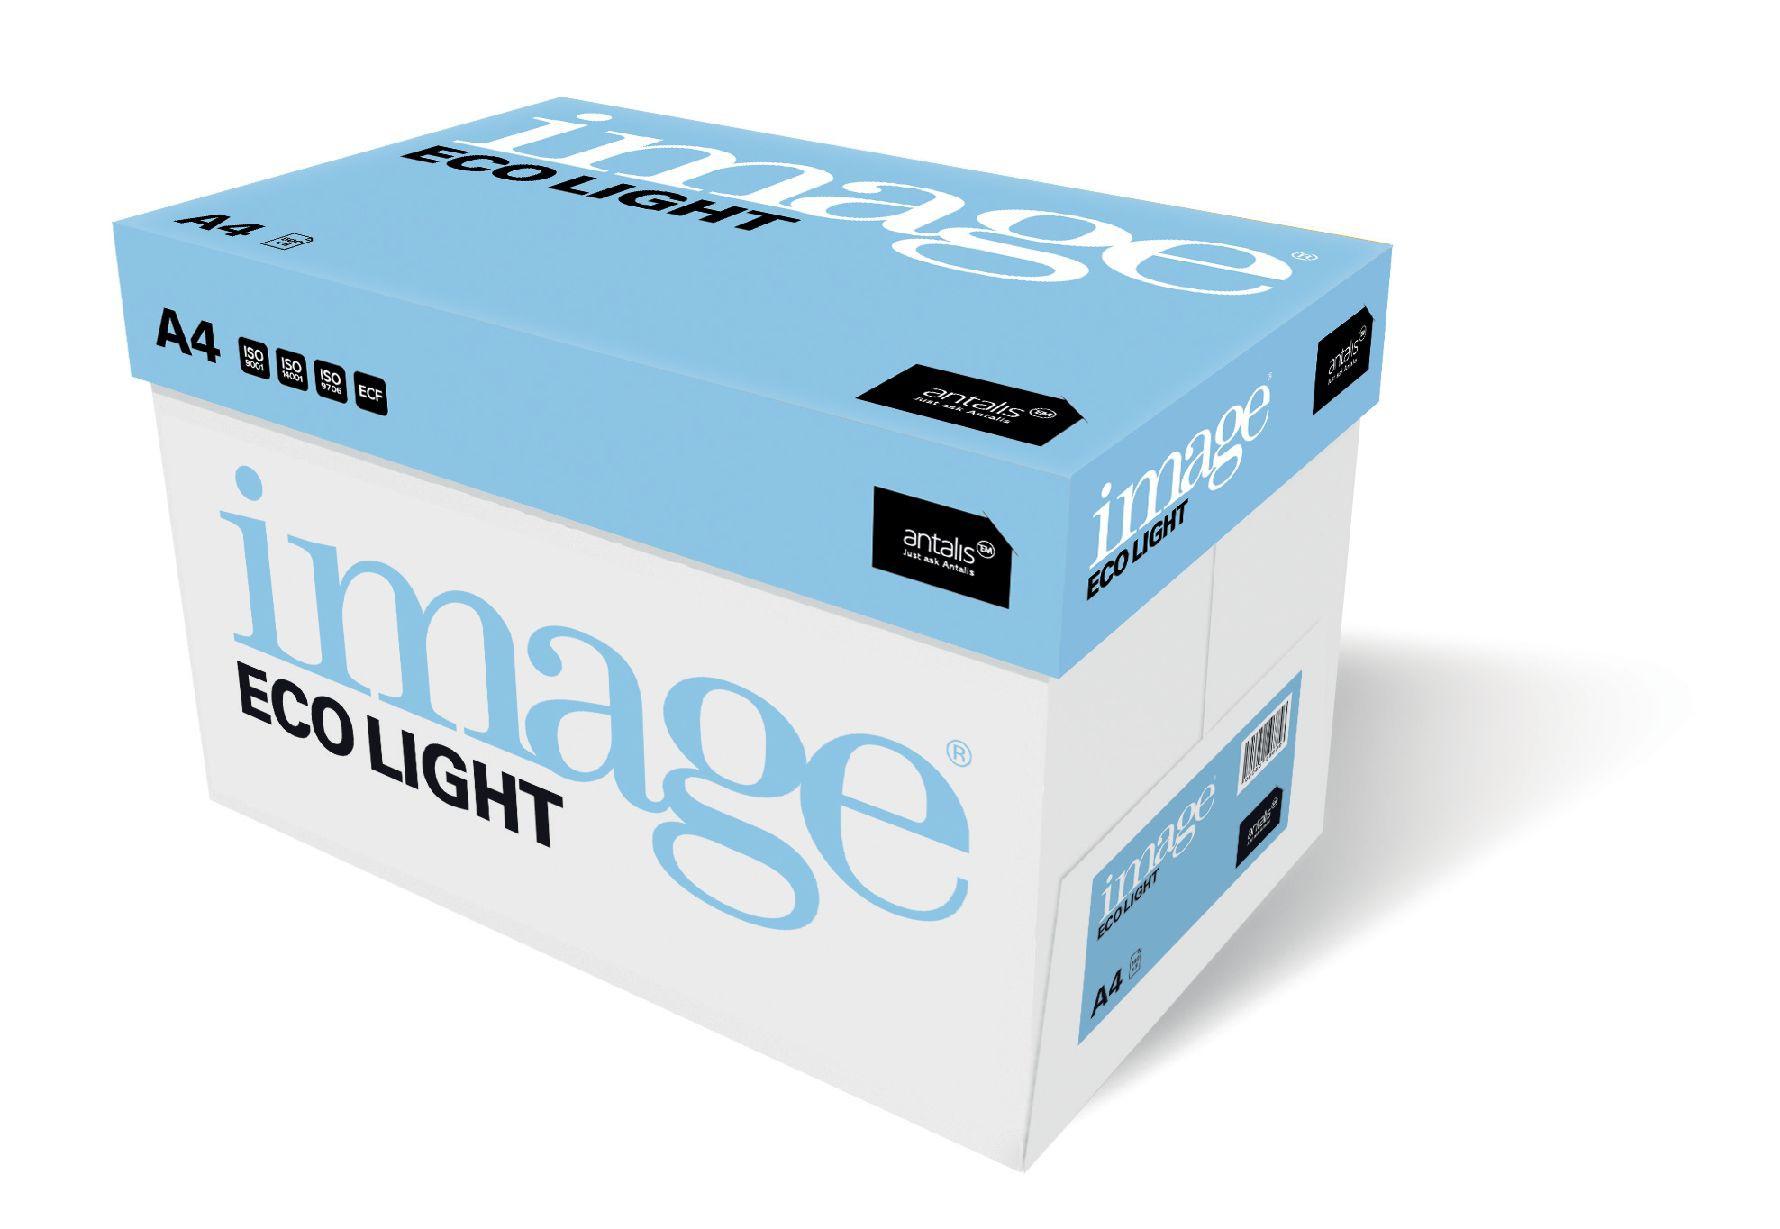 A4 White Copier Paper 2500 Sheets Box